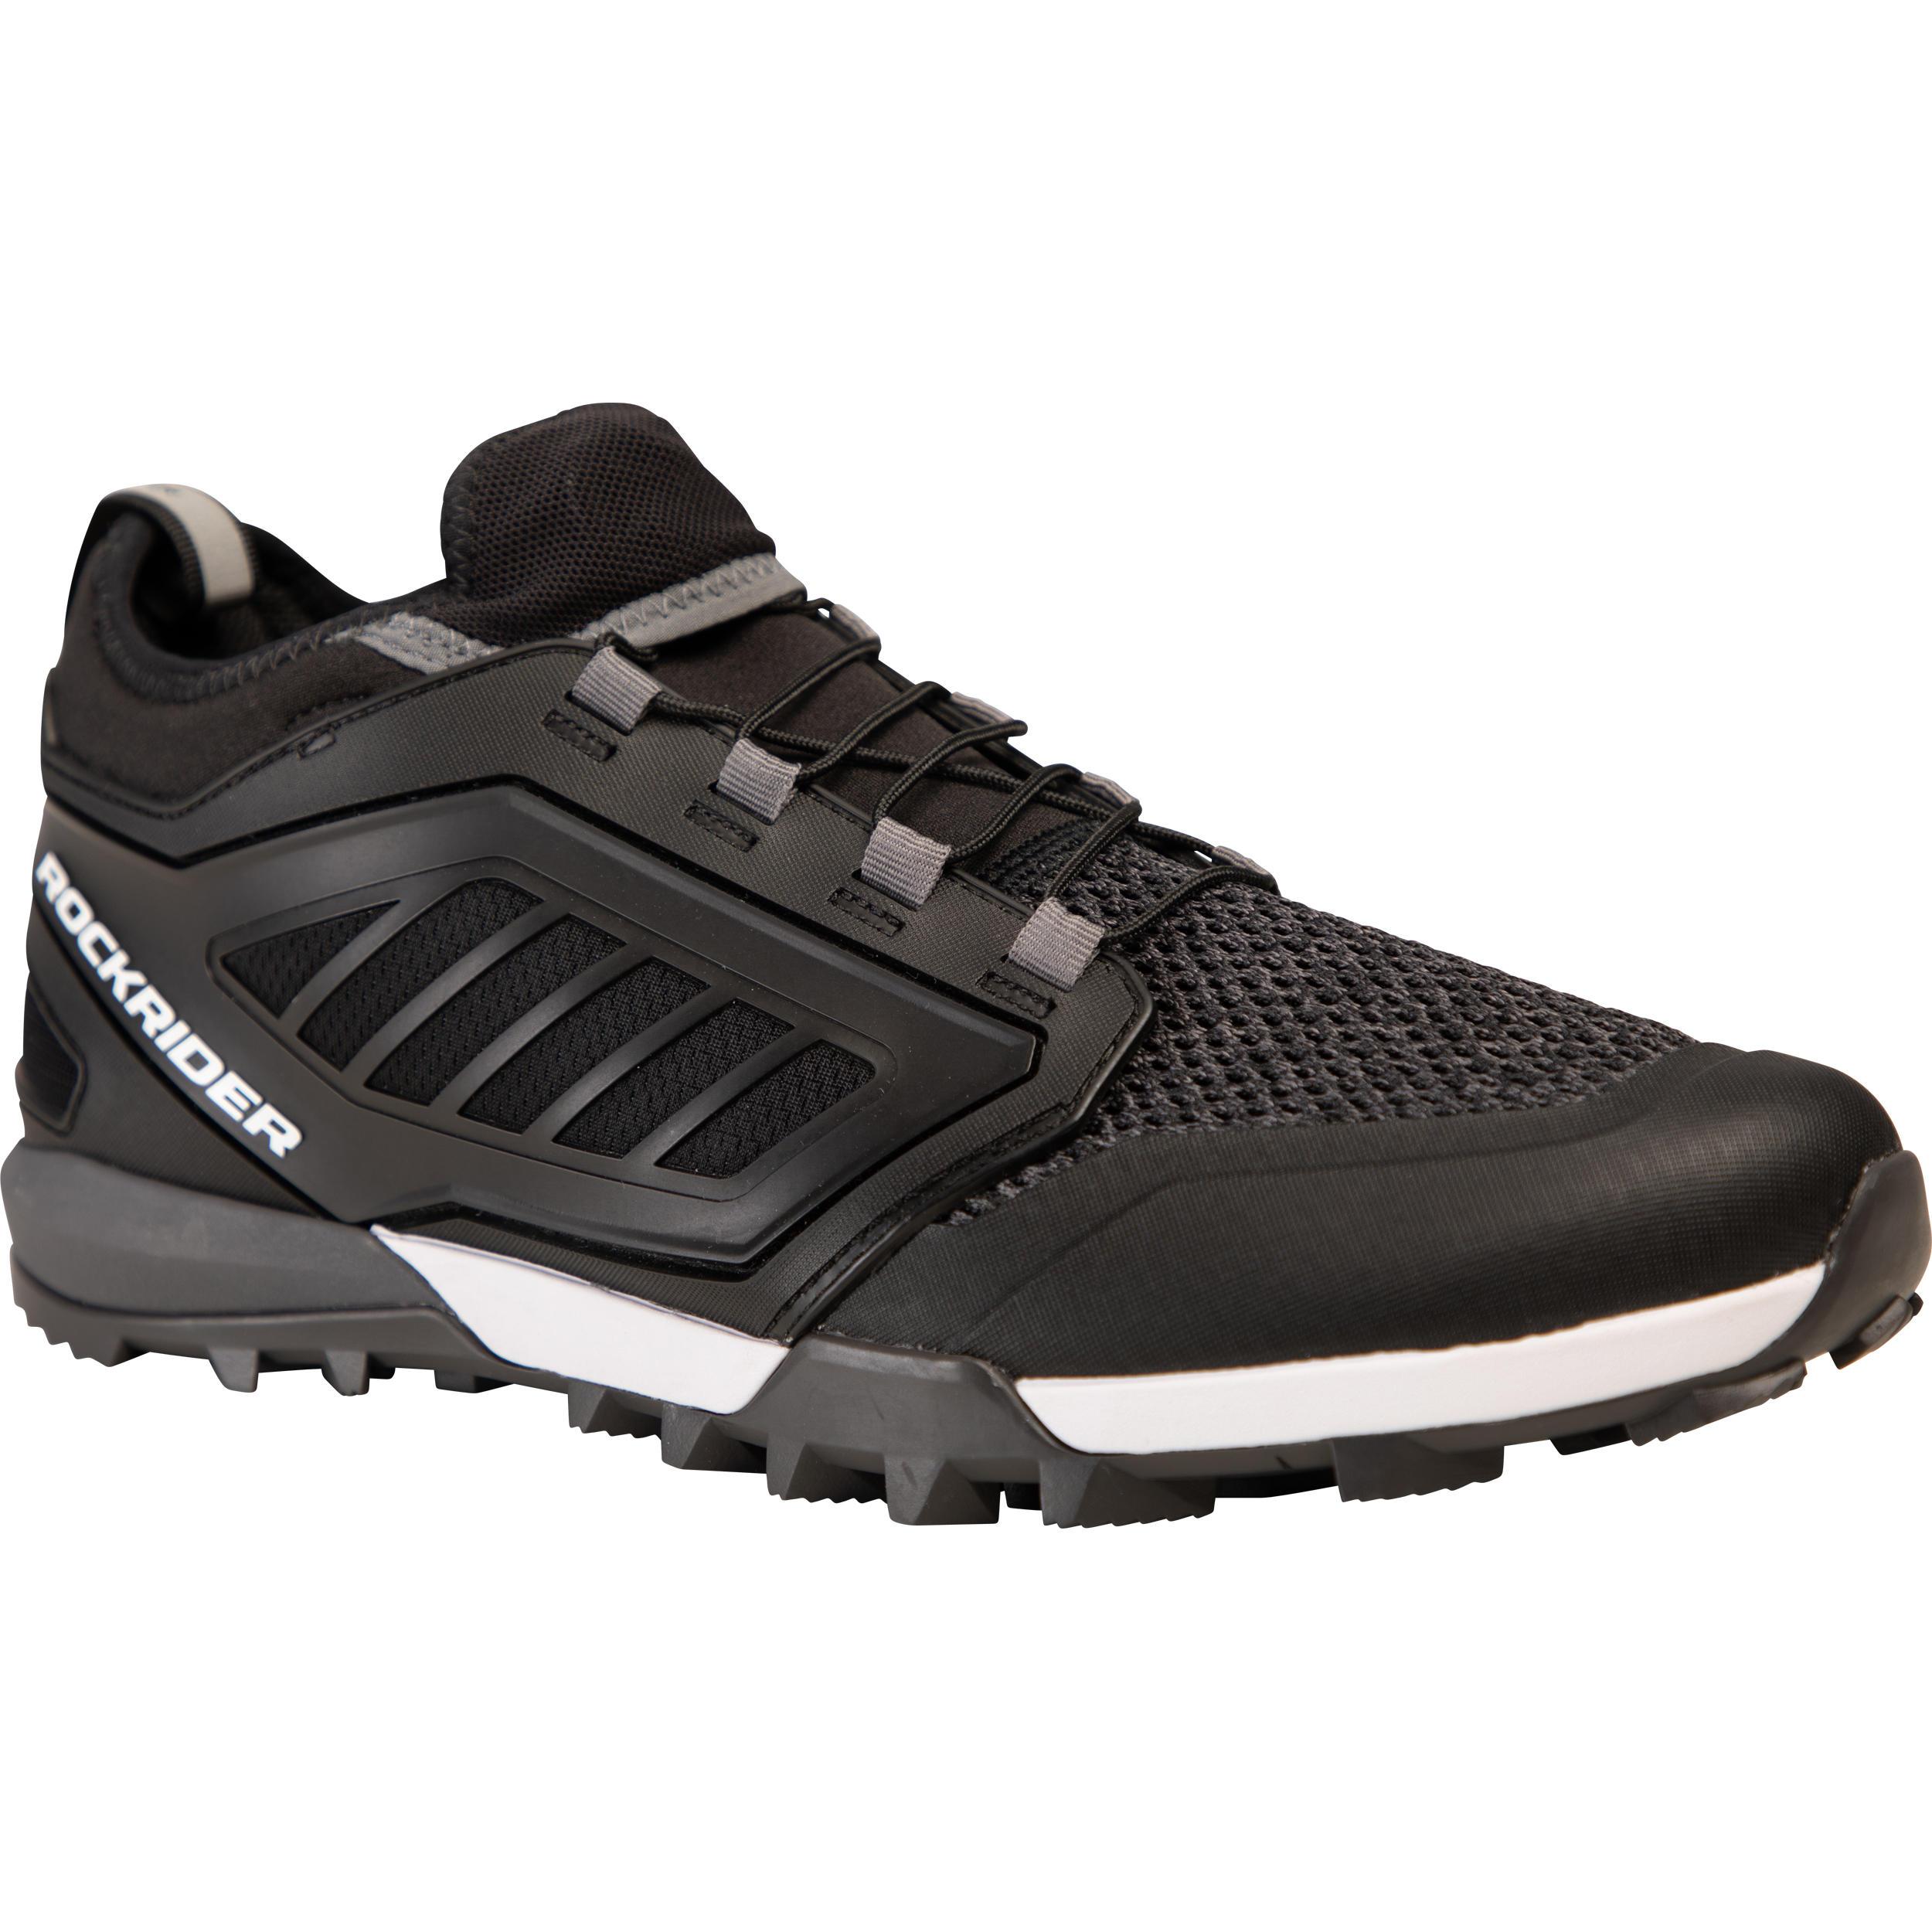 MTB-Schuhe ST 500 schwarz